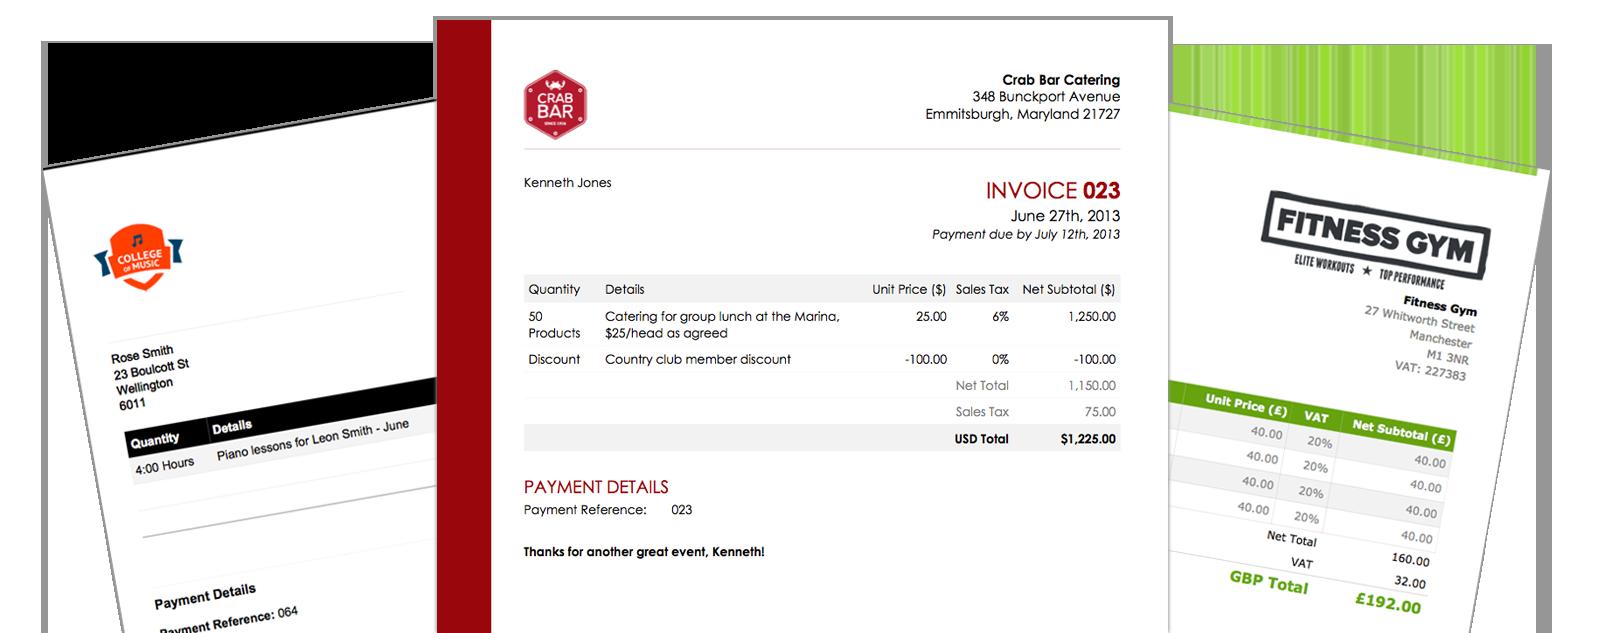 Forex invoice sample